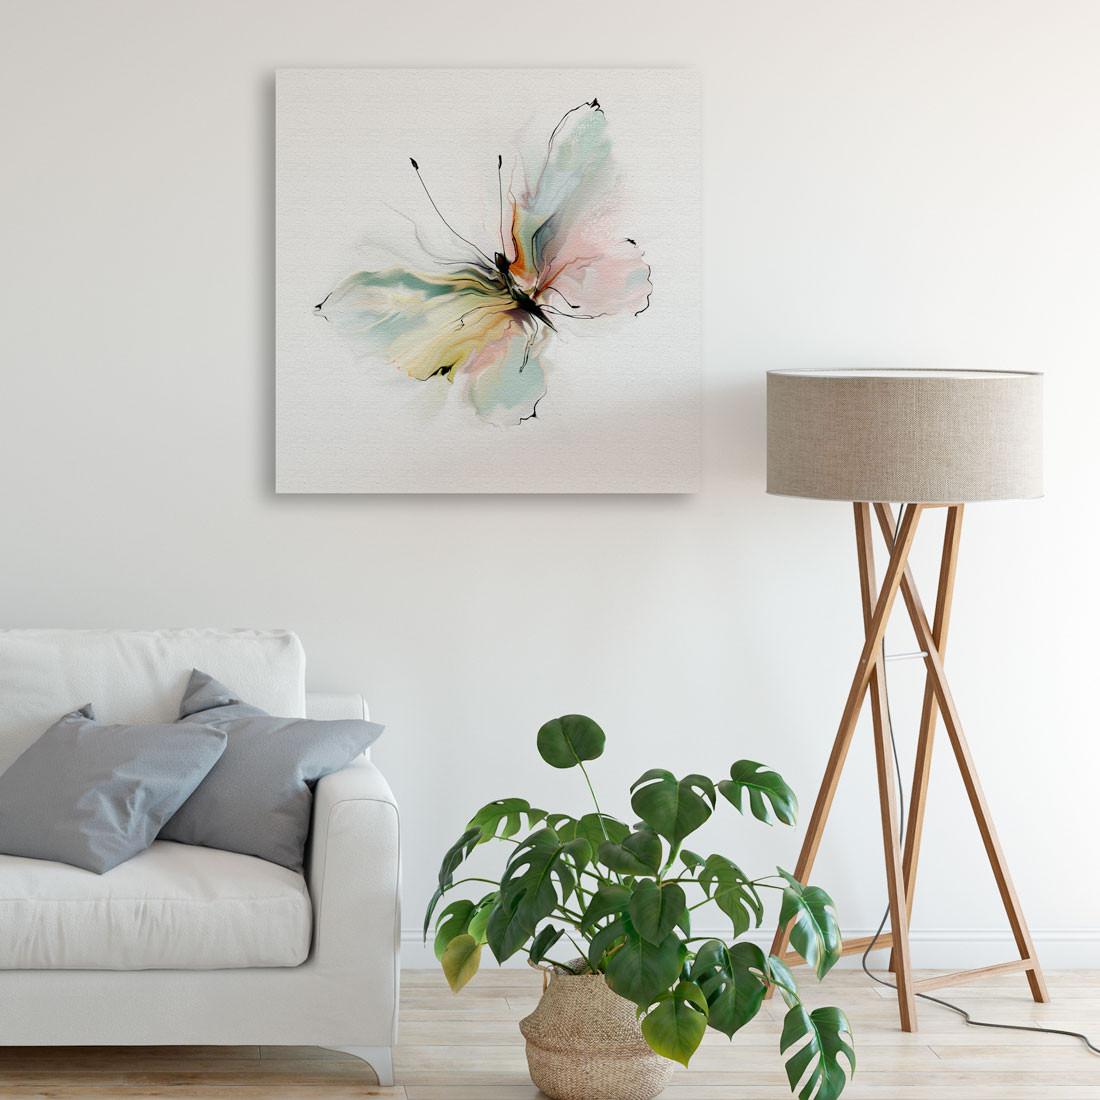 Quadro Decorativo Borboleta Pintura Aquarela